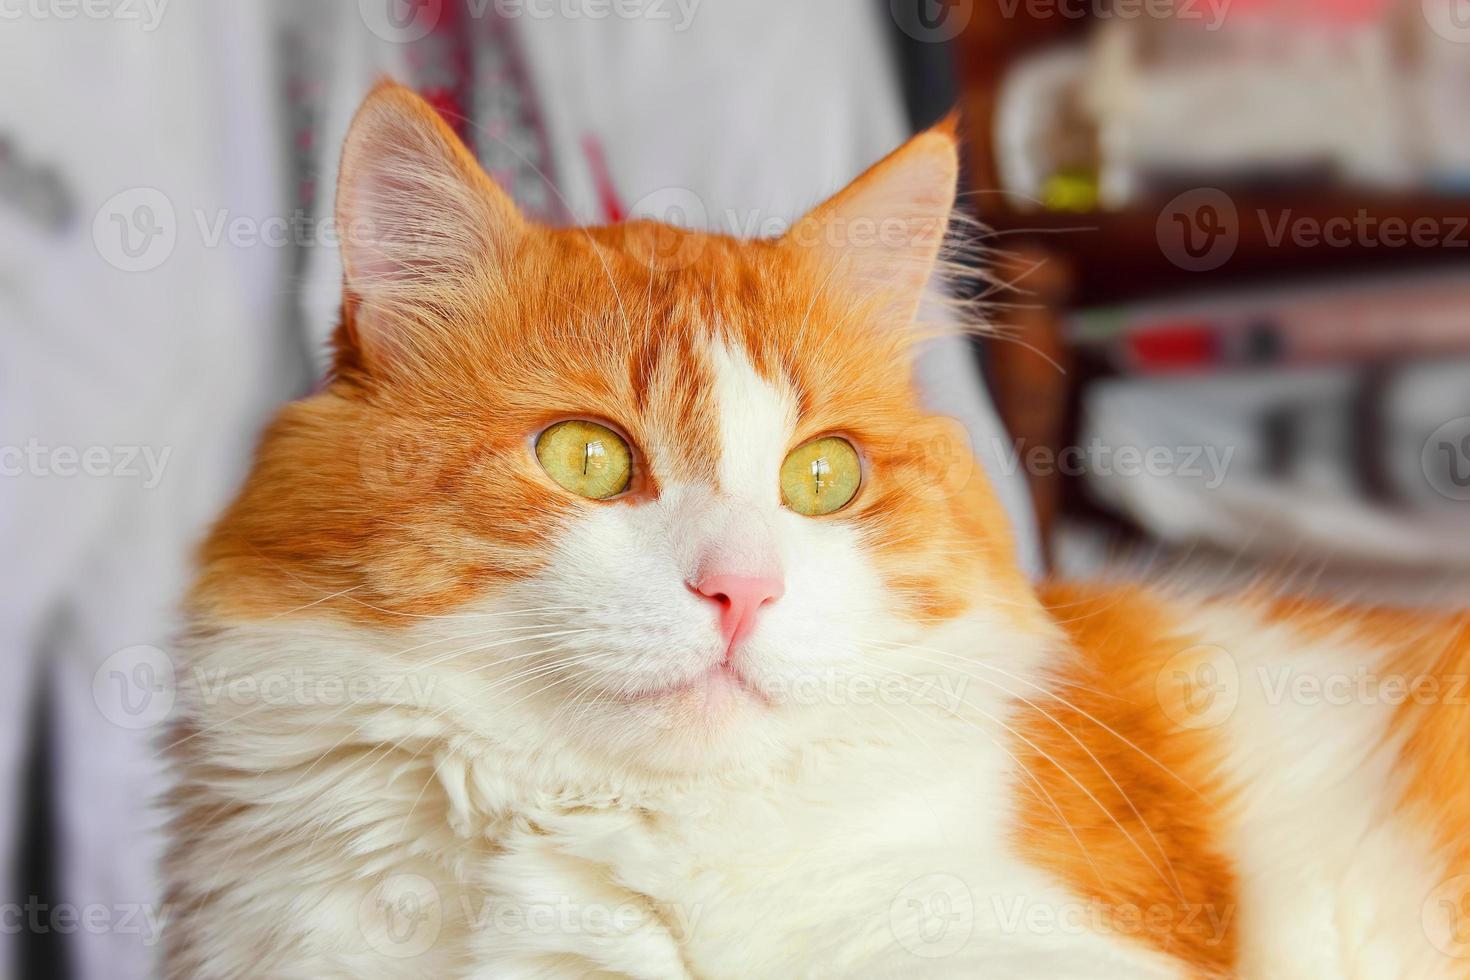 majestoso gato vermelho foto